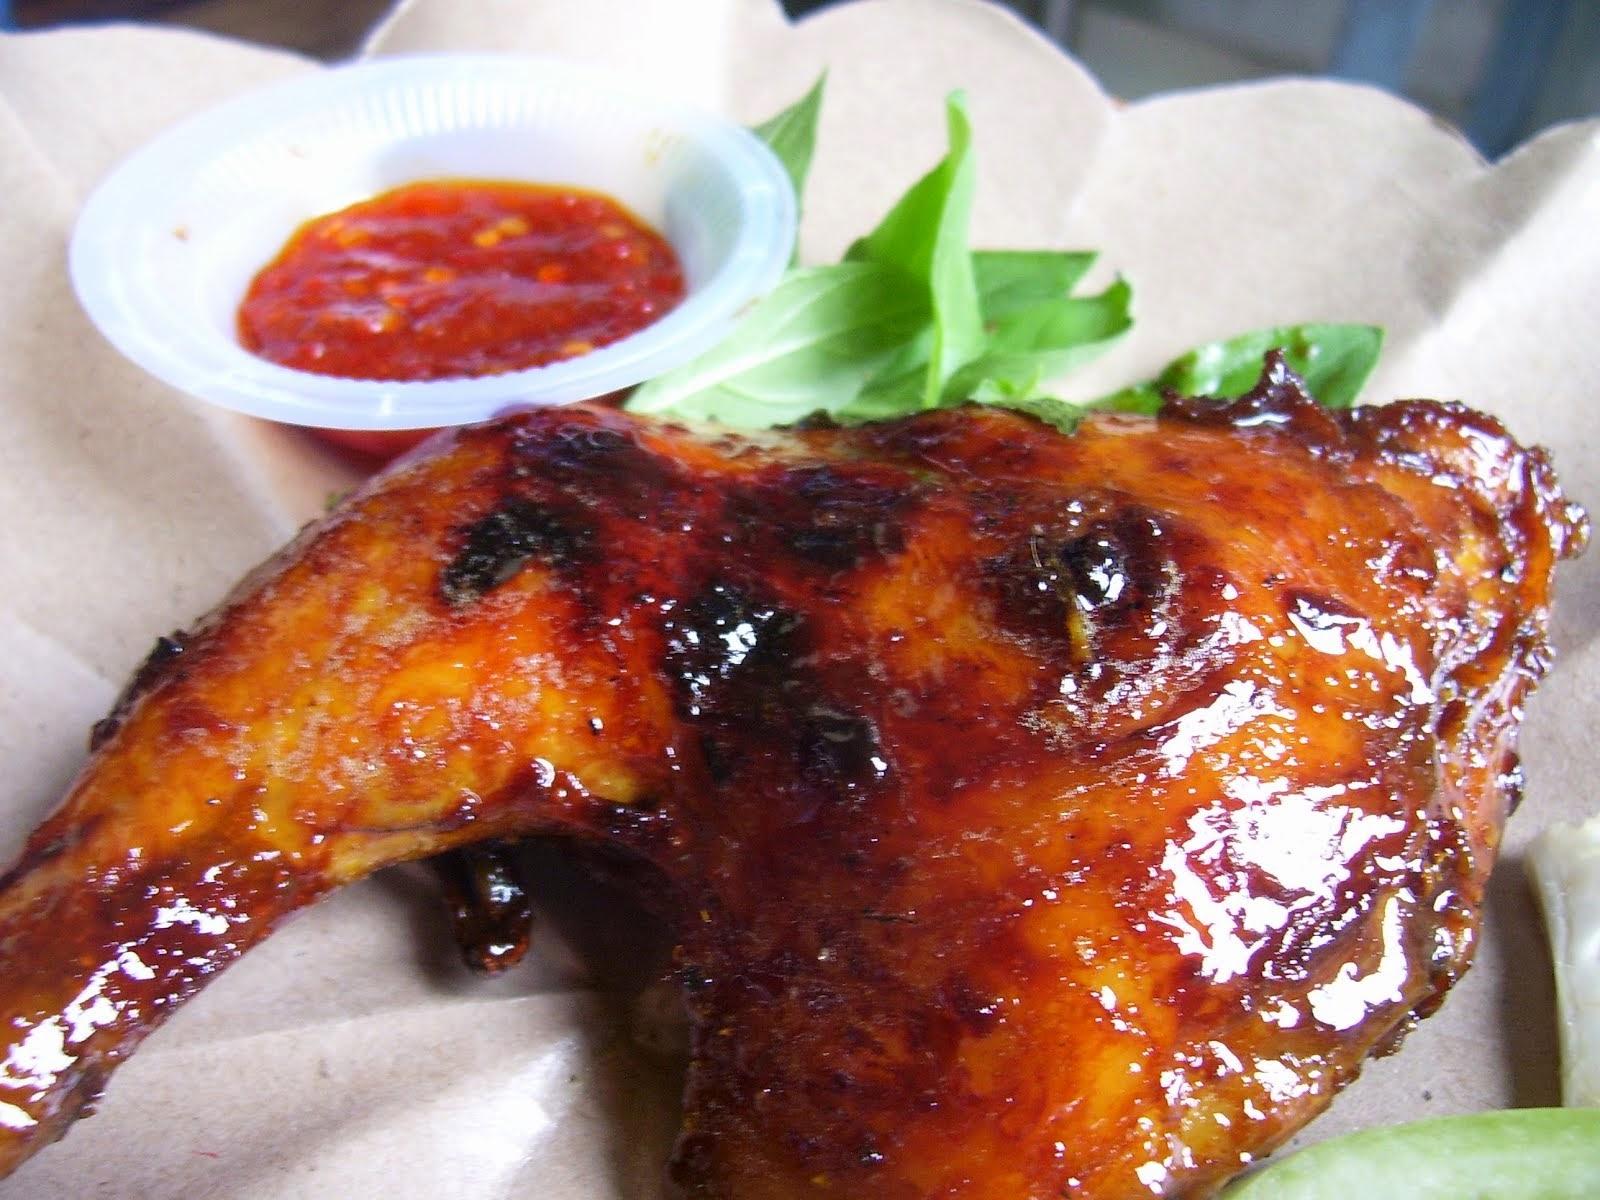 resep masakan ayam bakar kecap lezat   informasi terbaru